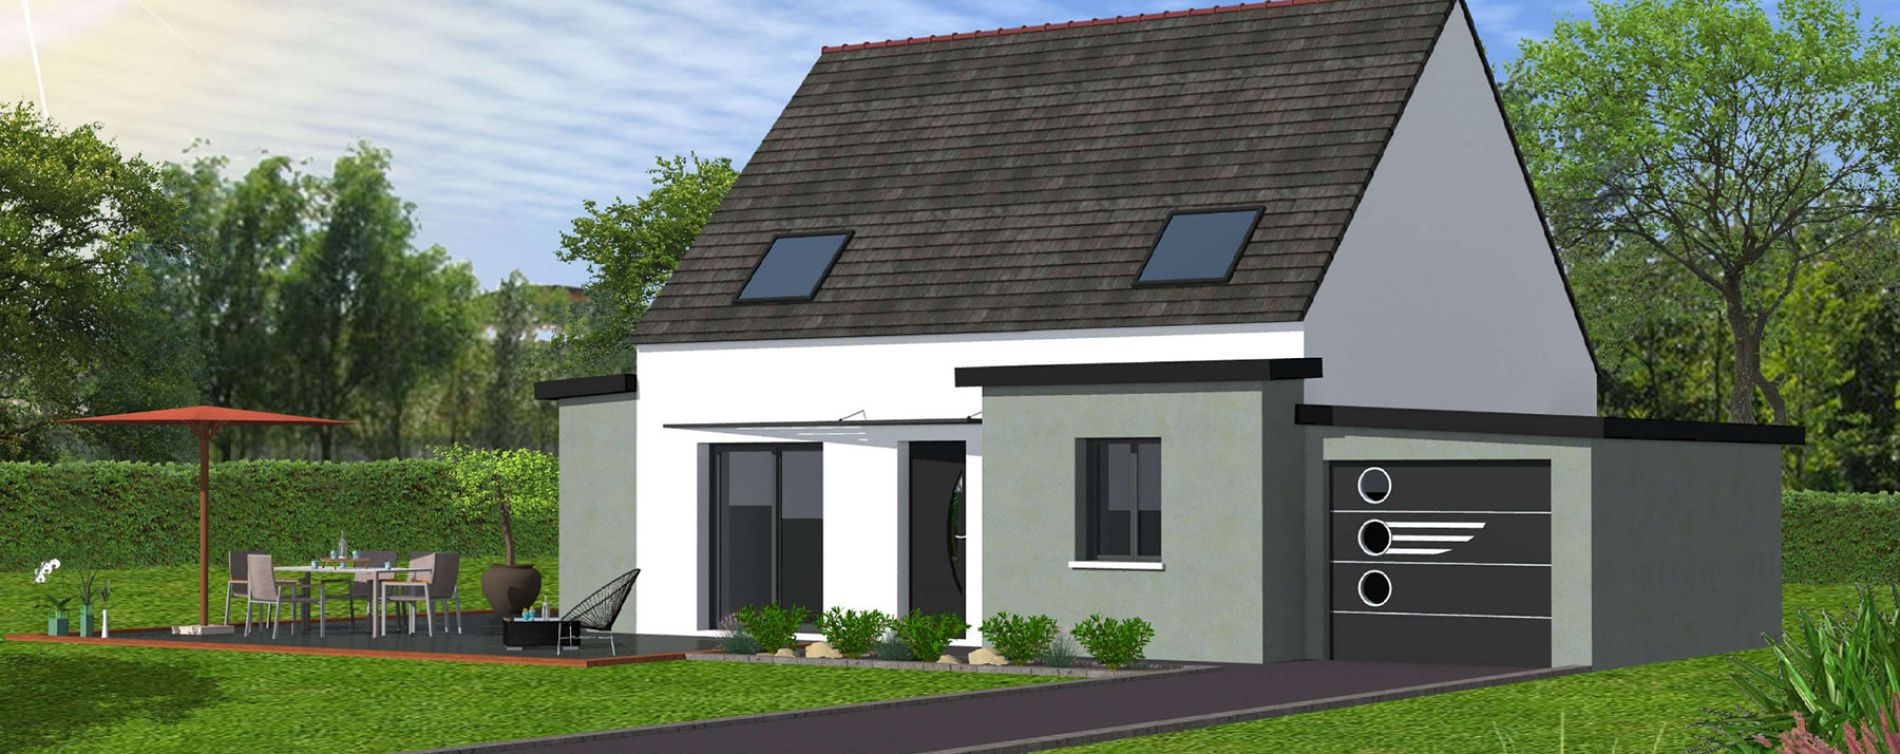 Ploudalmézeau : programme immobilier neuve « Roscaroc »